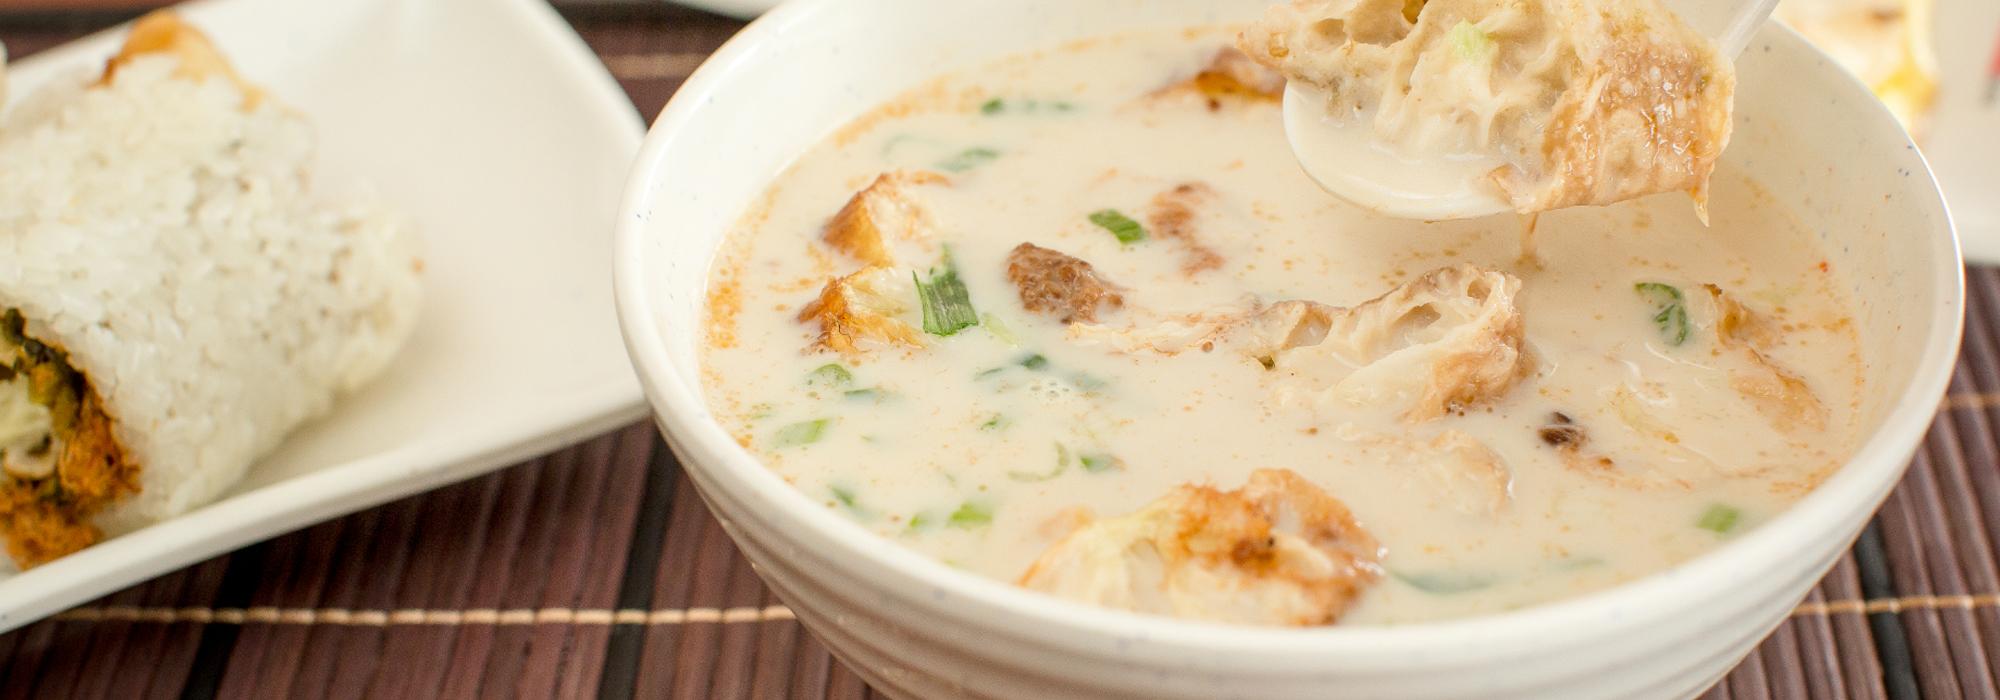 鹹豆漿 – Salty Soy Milk